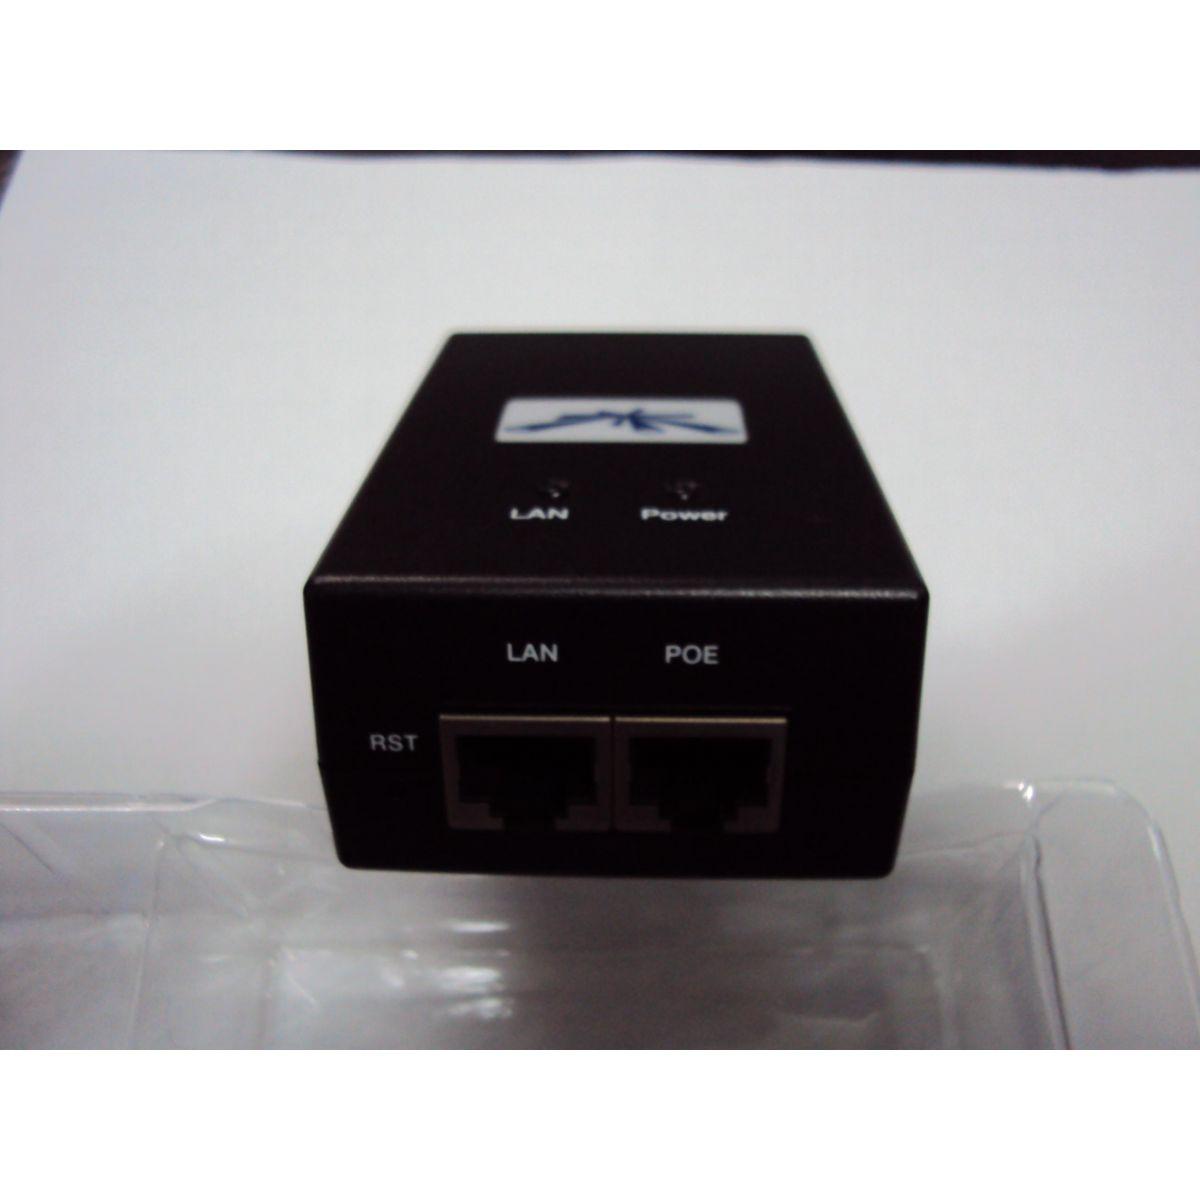 UBIQUITI FONTE- POE-24V-24W 1AMP  - TECTECH BRASIL COMPUTERS